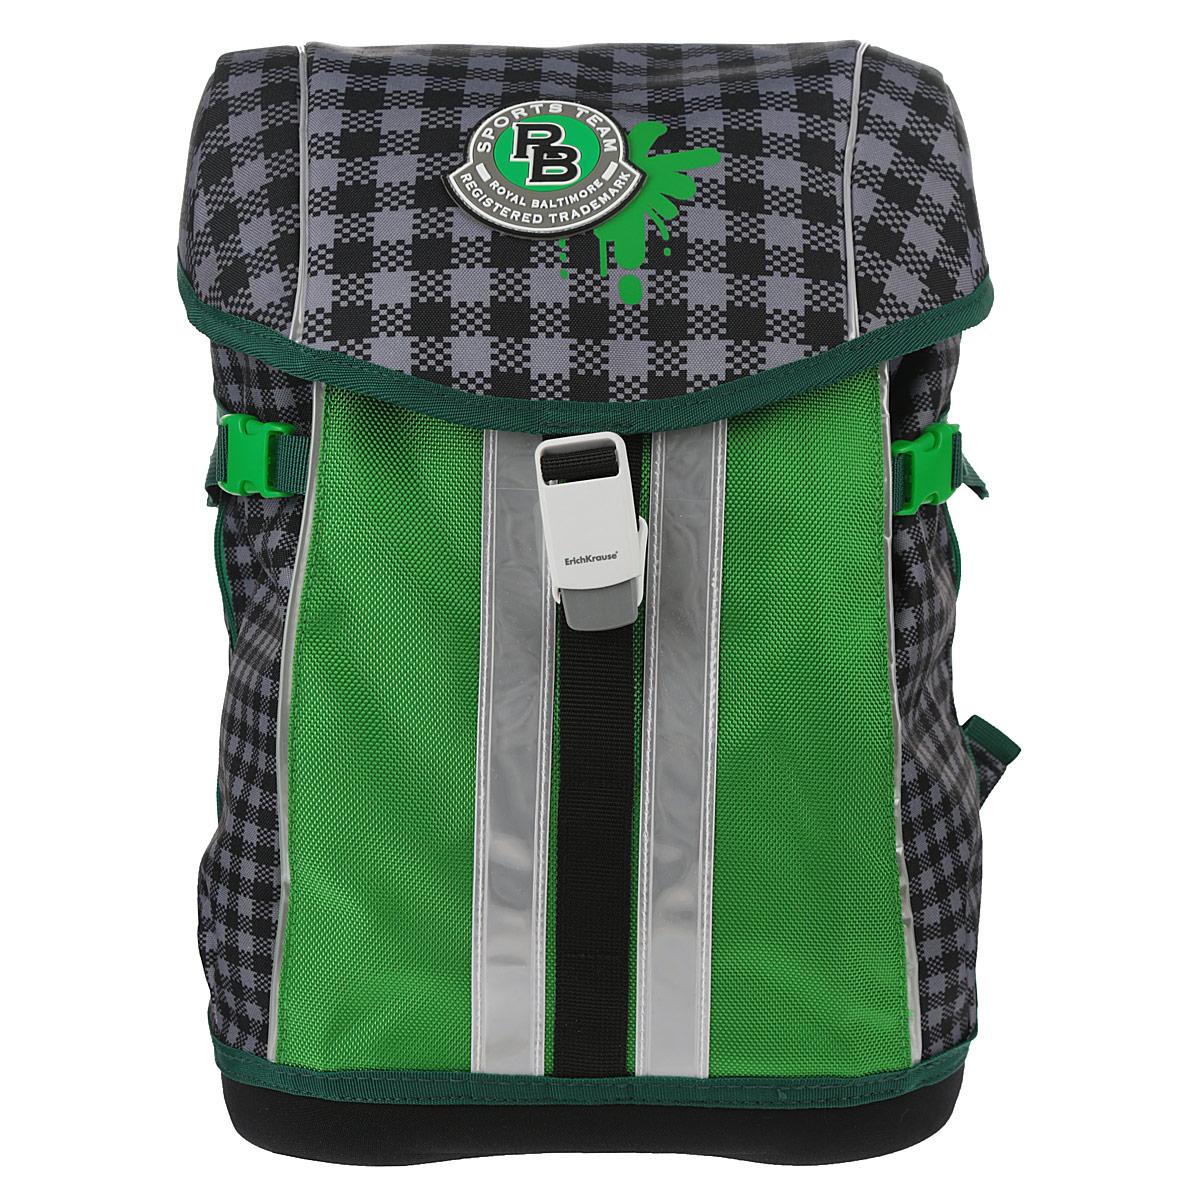 "Ранец Erich Krause ""Sport Baltimore"", цвет: серый, зеленый, Erich Krause Deutschland GmbH"